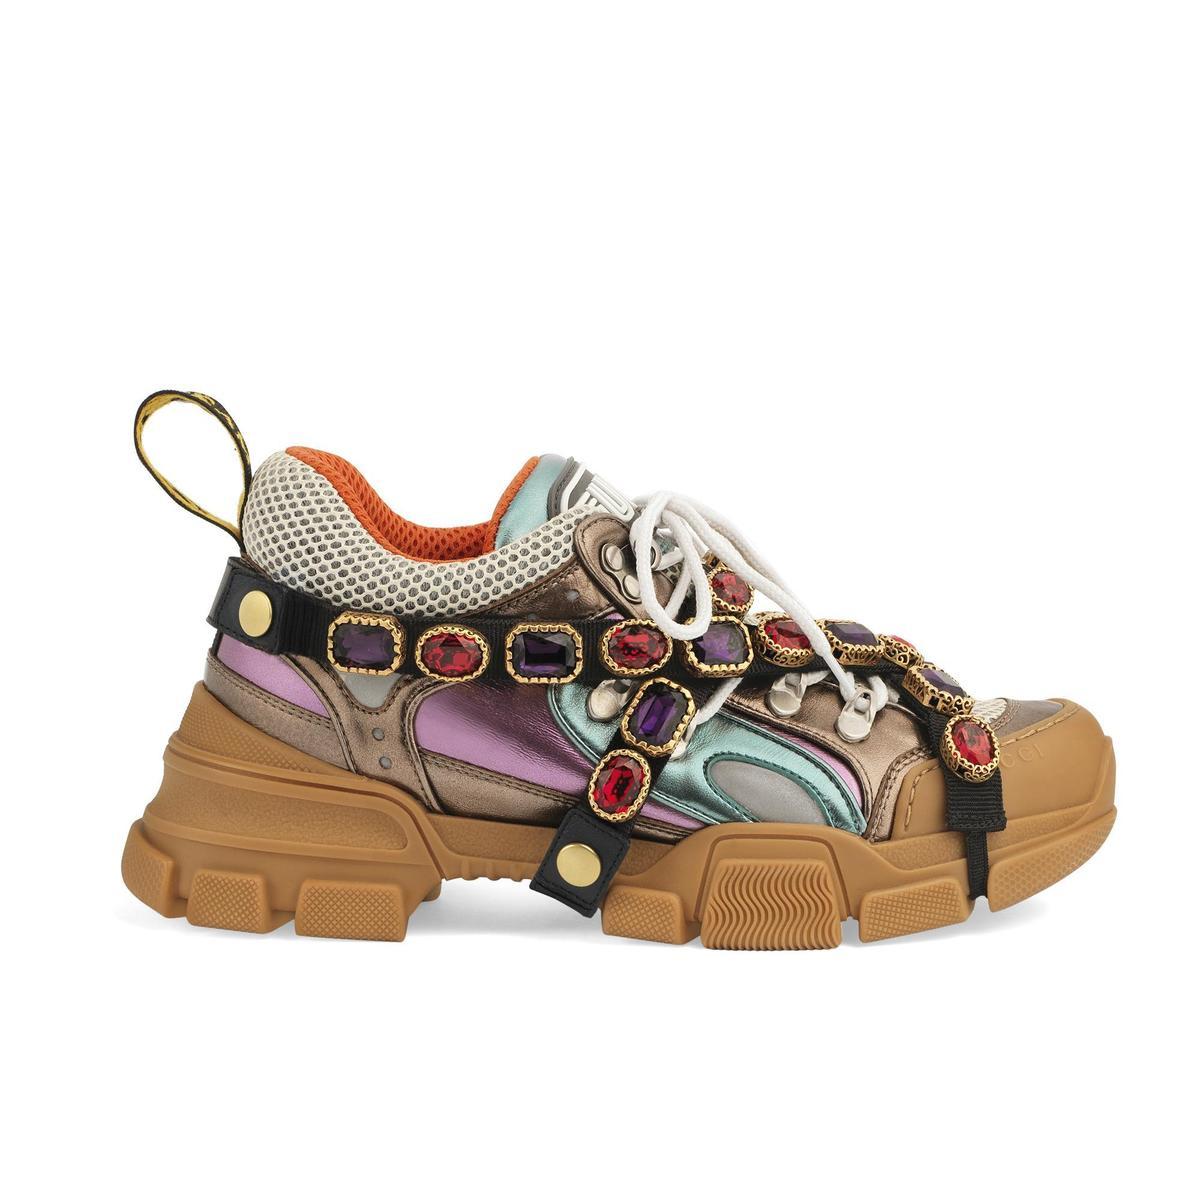 Flashtrek 彩色金屬與水晶飾帶裝飾復古運動鞋,NT$53,200。(品牌提供)